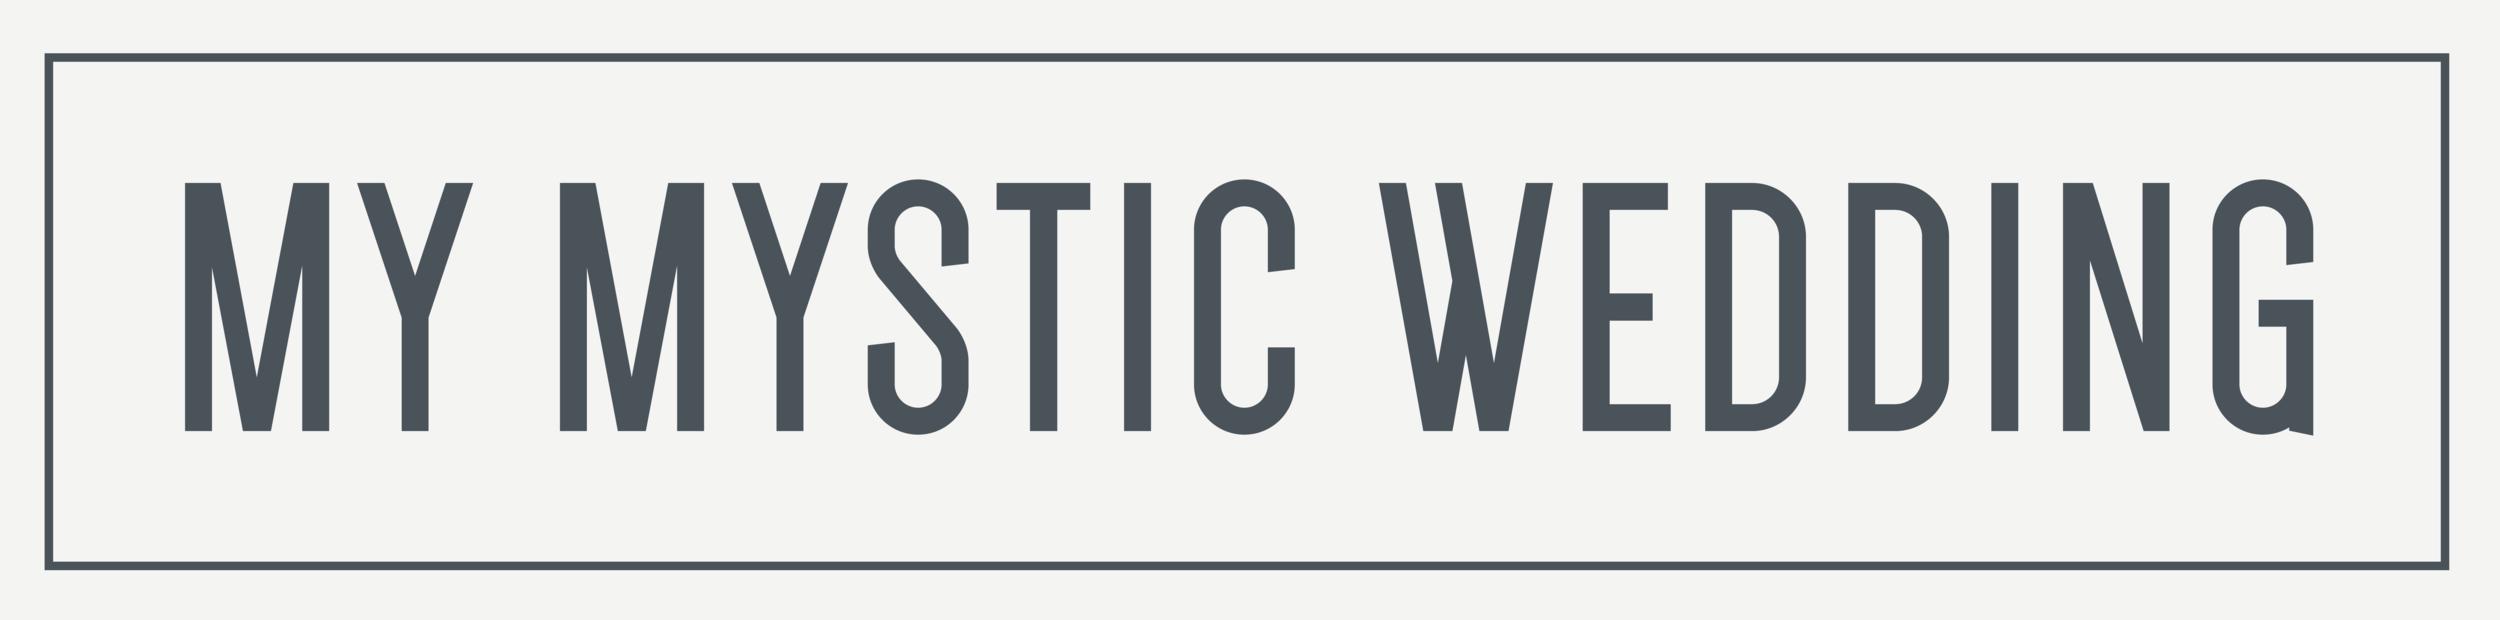 my mystic wedding logo design